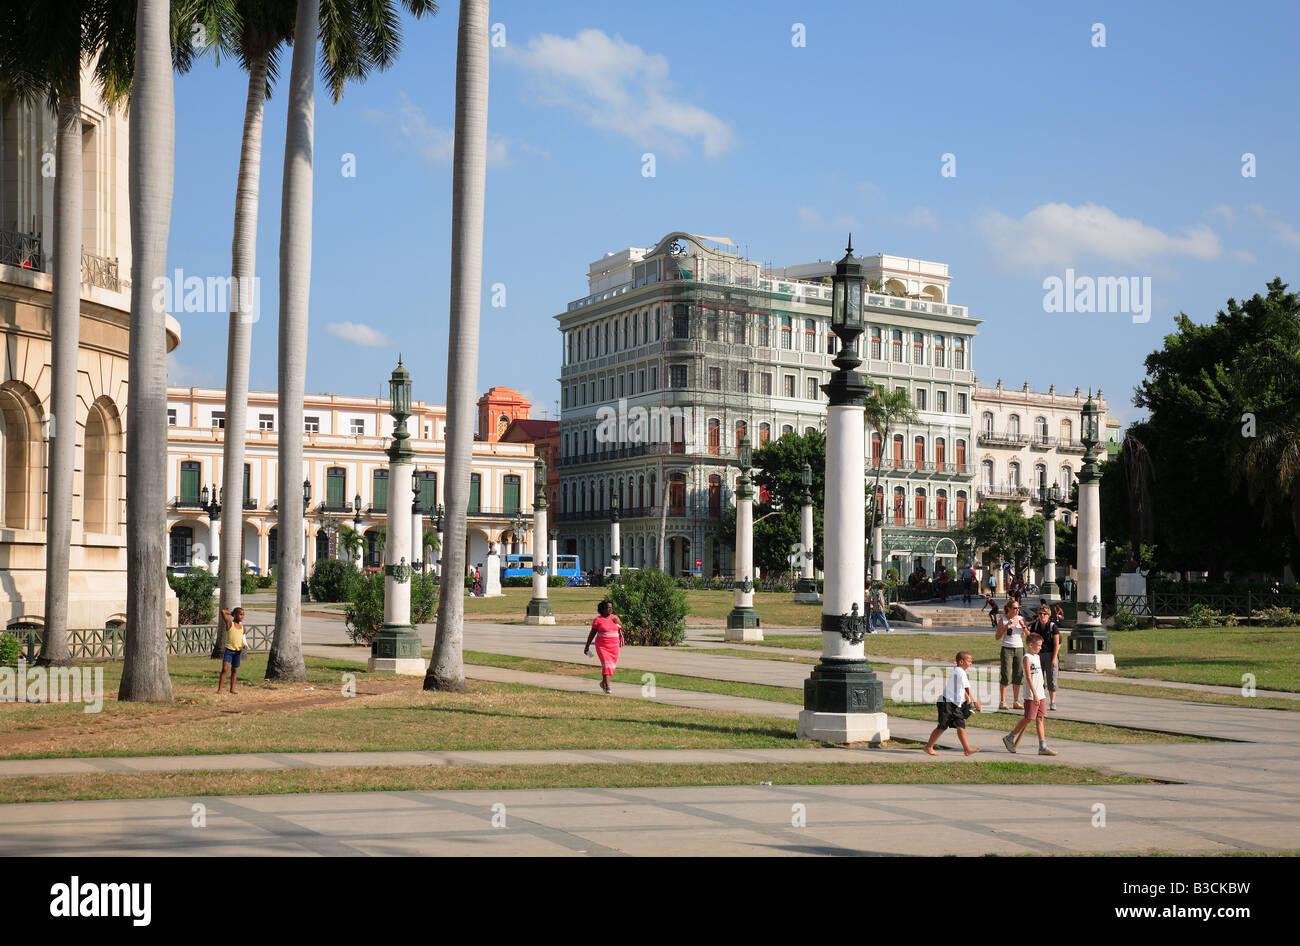 Parque Central am Boulevard Paseo de Marti platz am Capitol Havanna Havanna Habana Kuba Stockbild